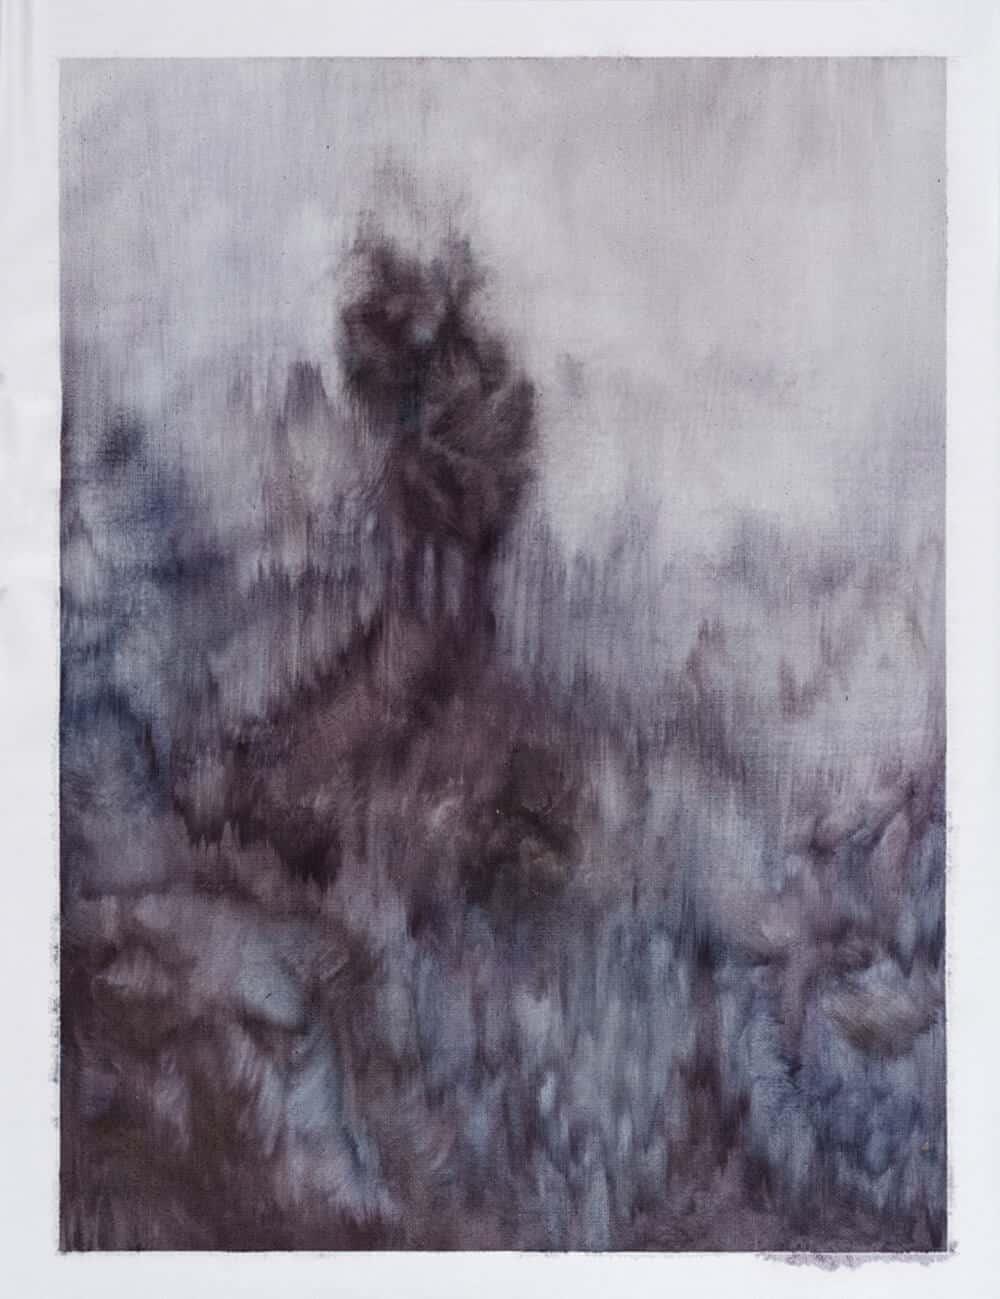 ZARAH CASSIM. Purple Matter, 2017. Oil on canvas paper. 435 x 335mm. Framed